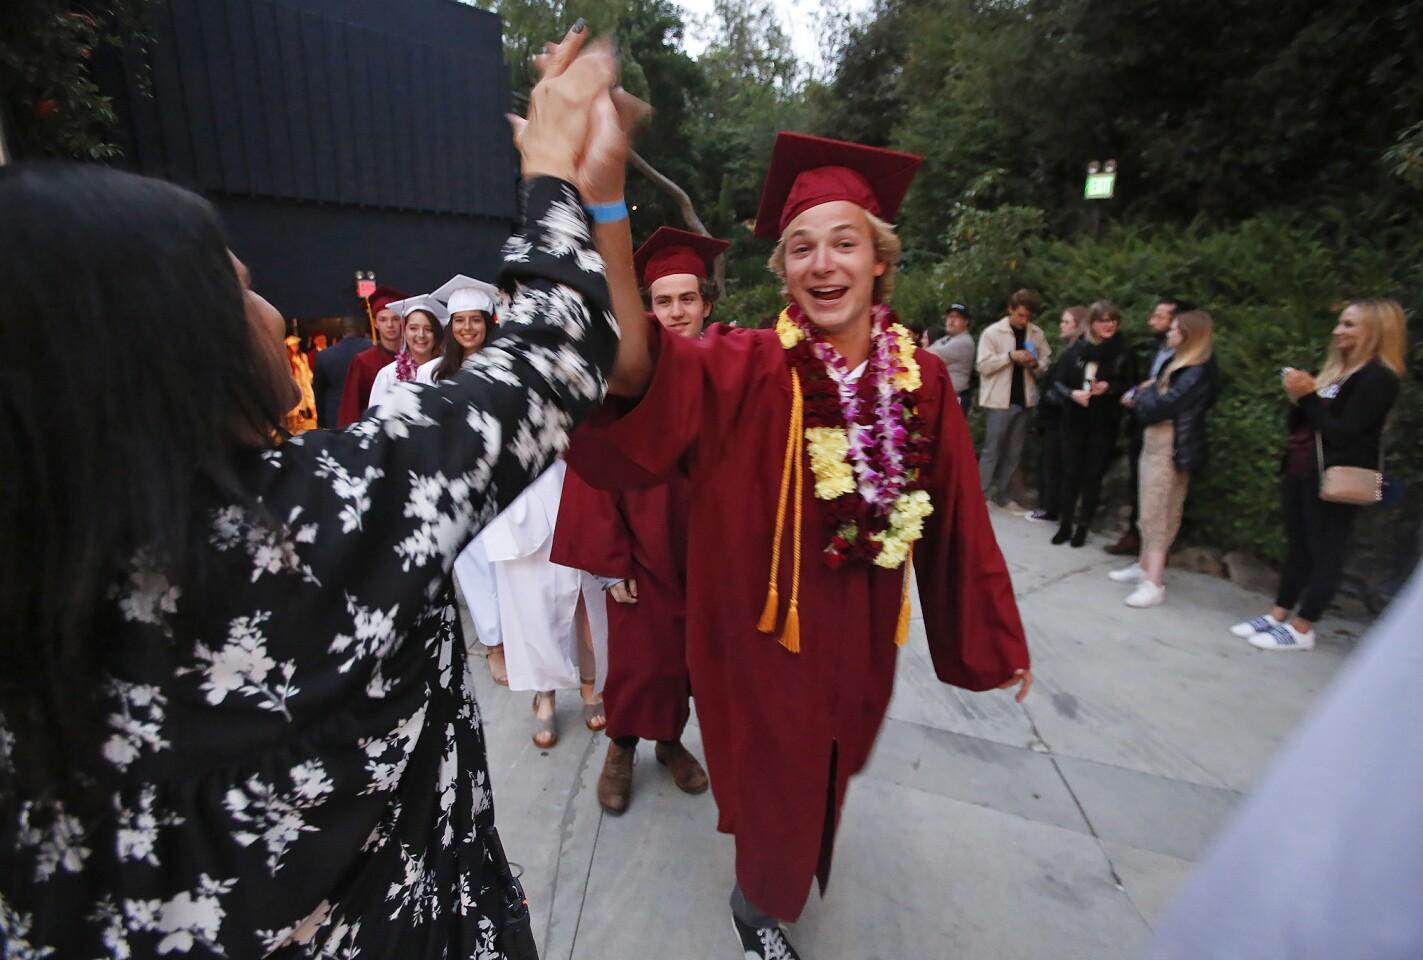 Laguna Beach High class of 2019 graduation ceremony